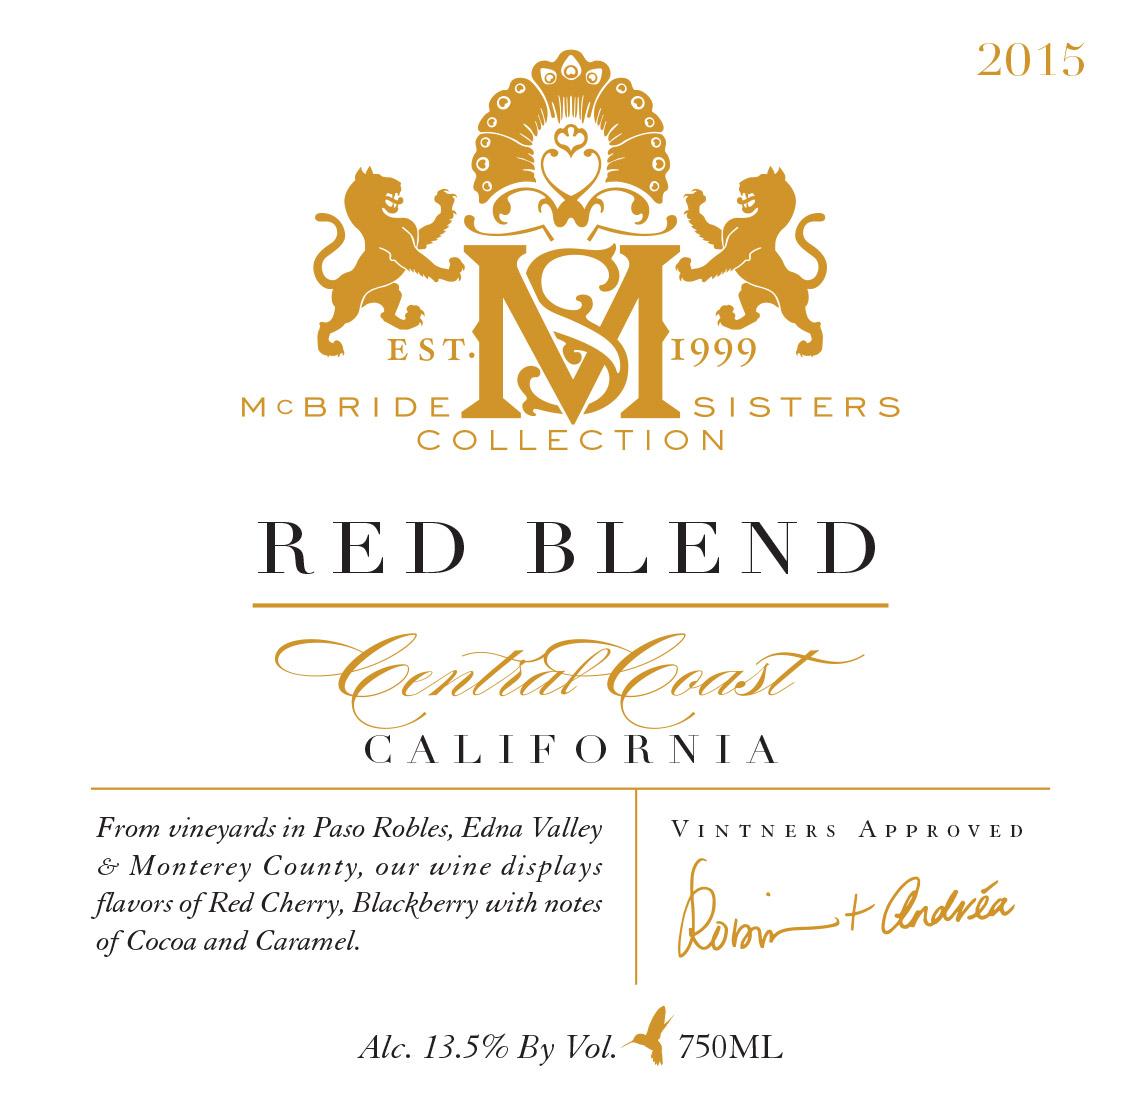 McBrideSisters-Red-Blend-Back-label-3.8in-X-3.1in.jpg